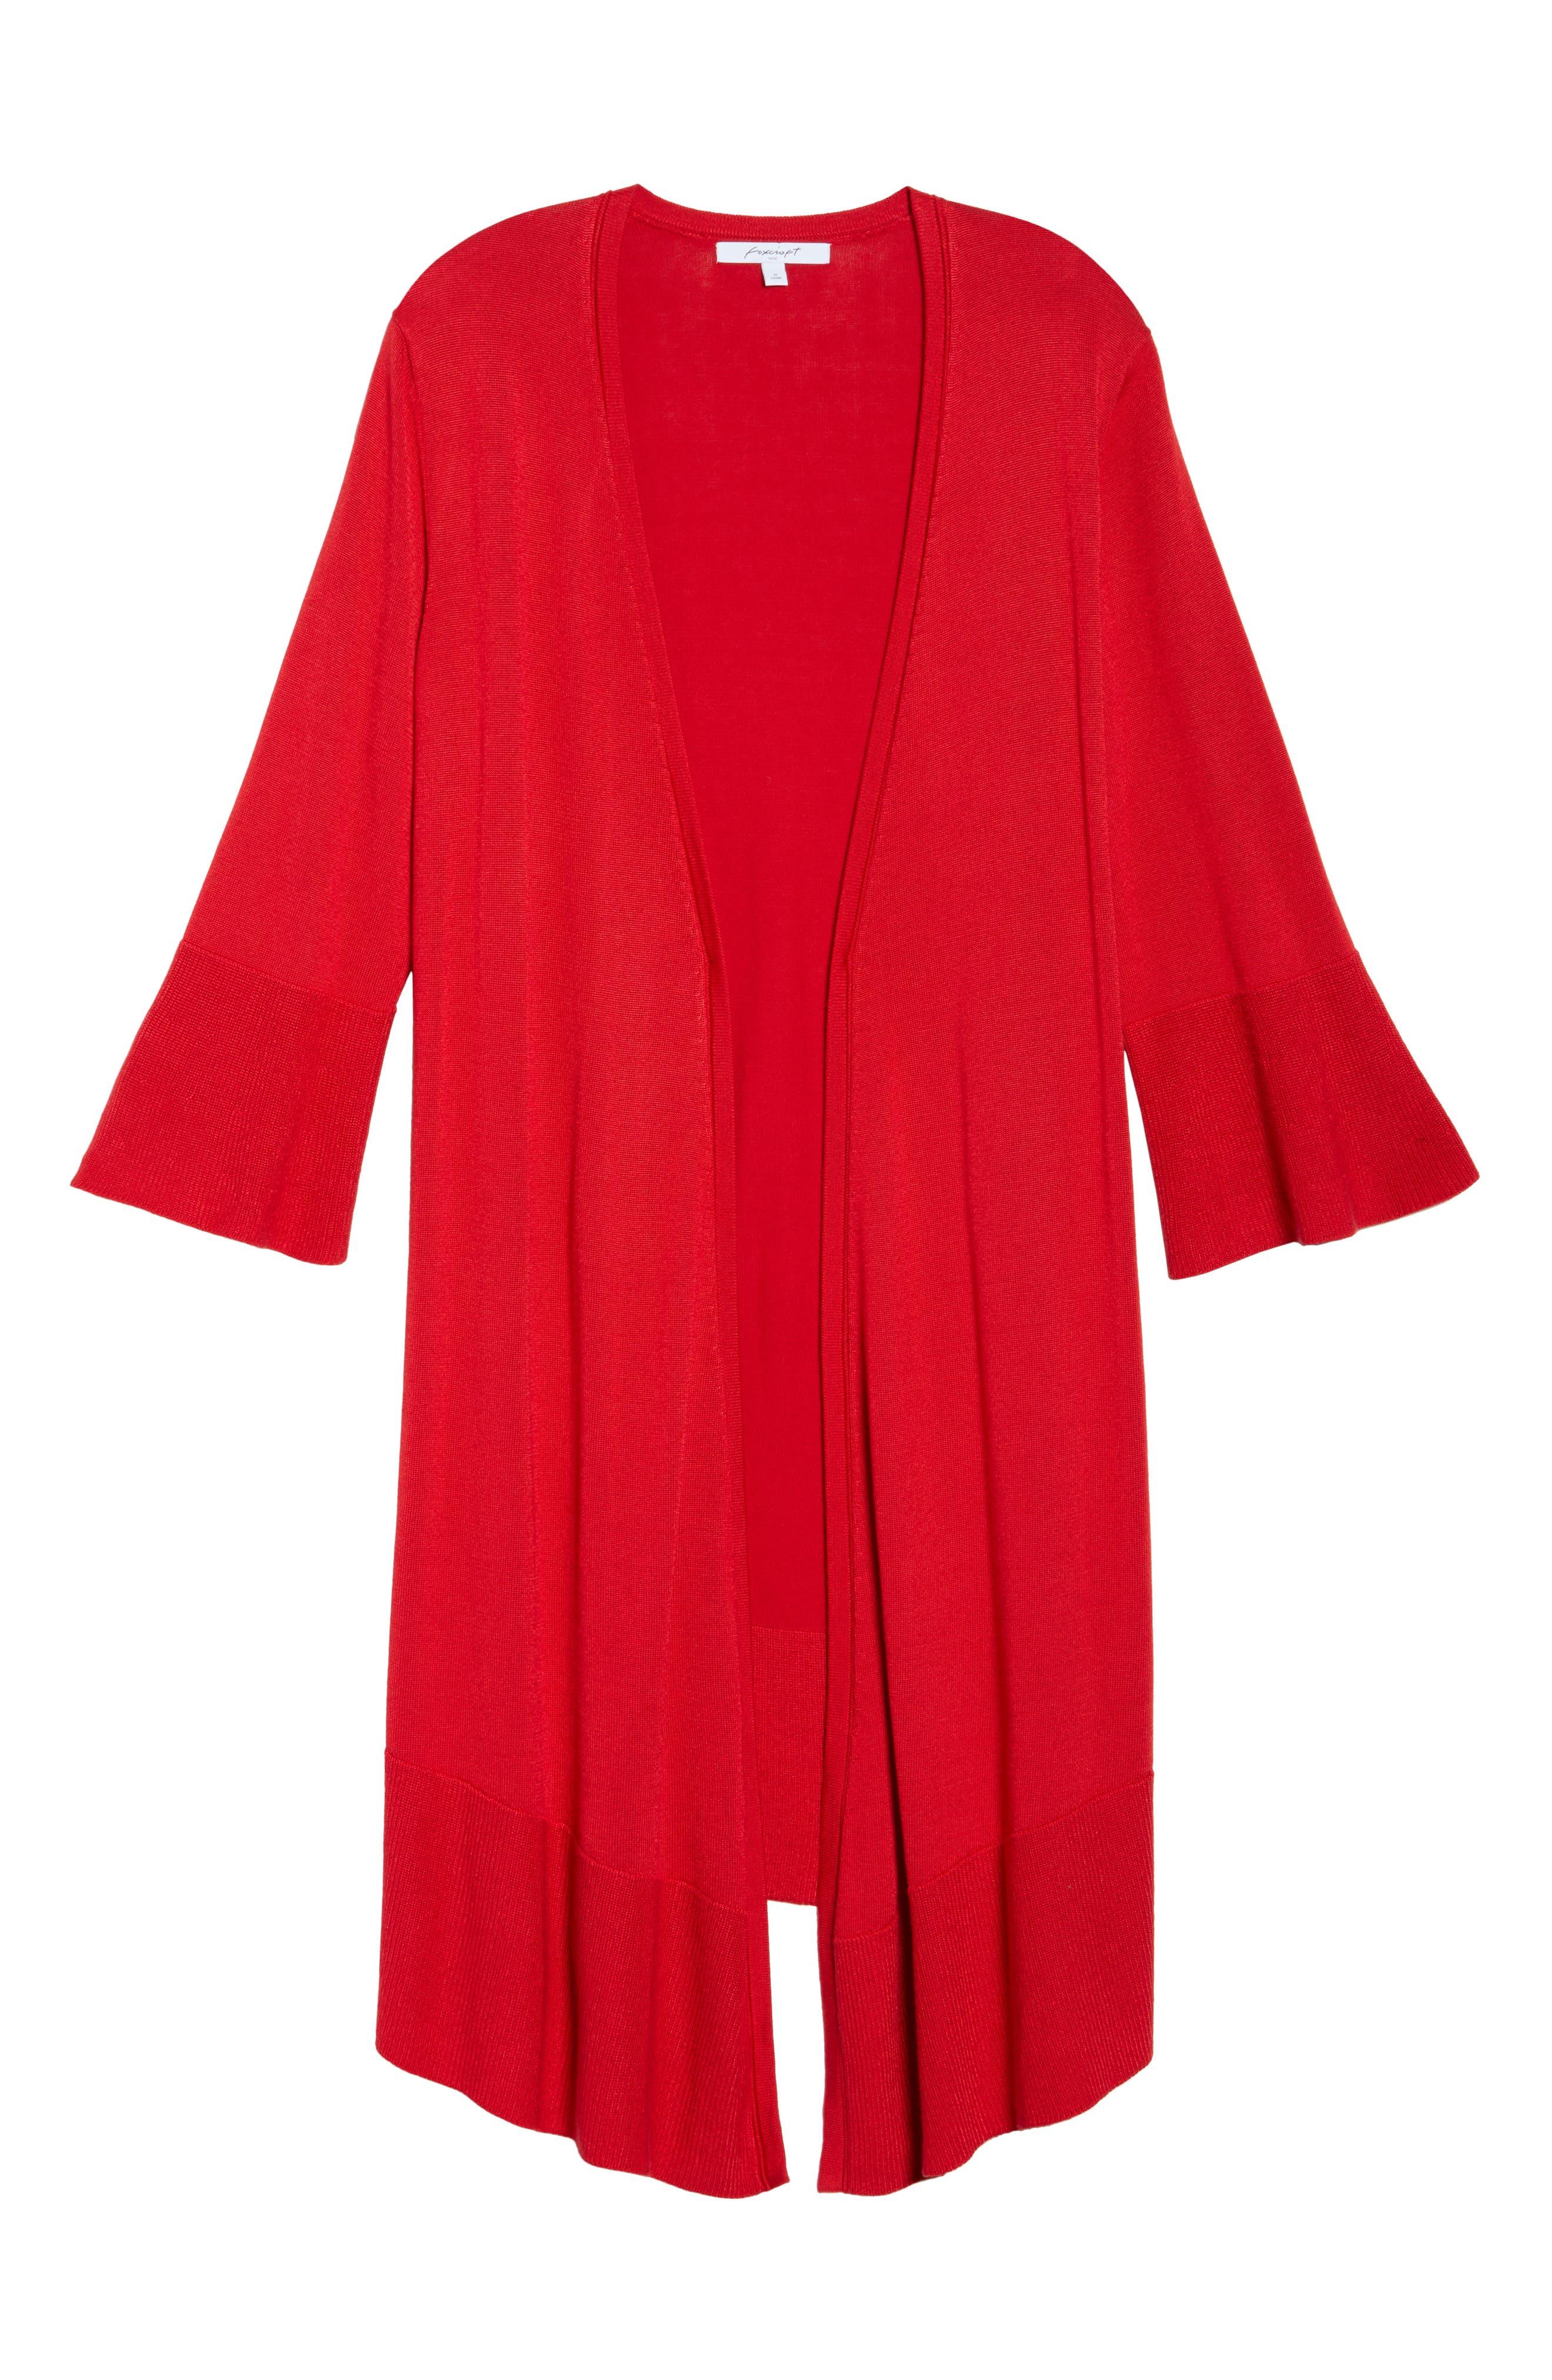 Mila Bell Sleeve Long Cardigan,                             Alternate thumbnail 6, color,                             Scarlet